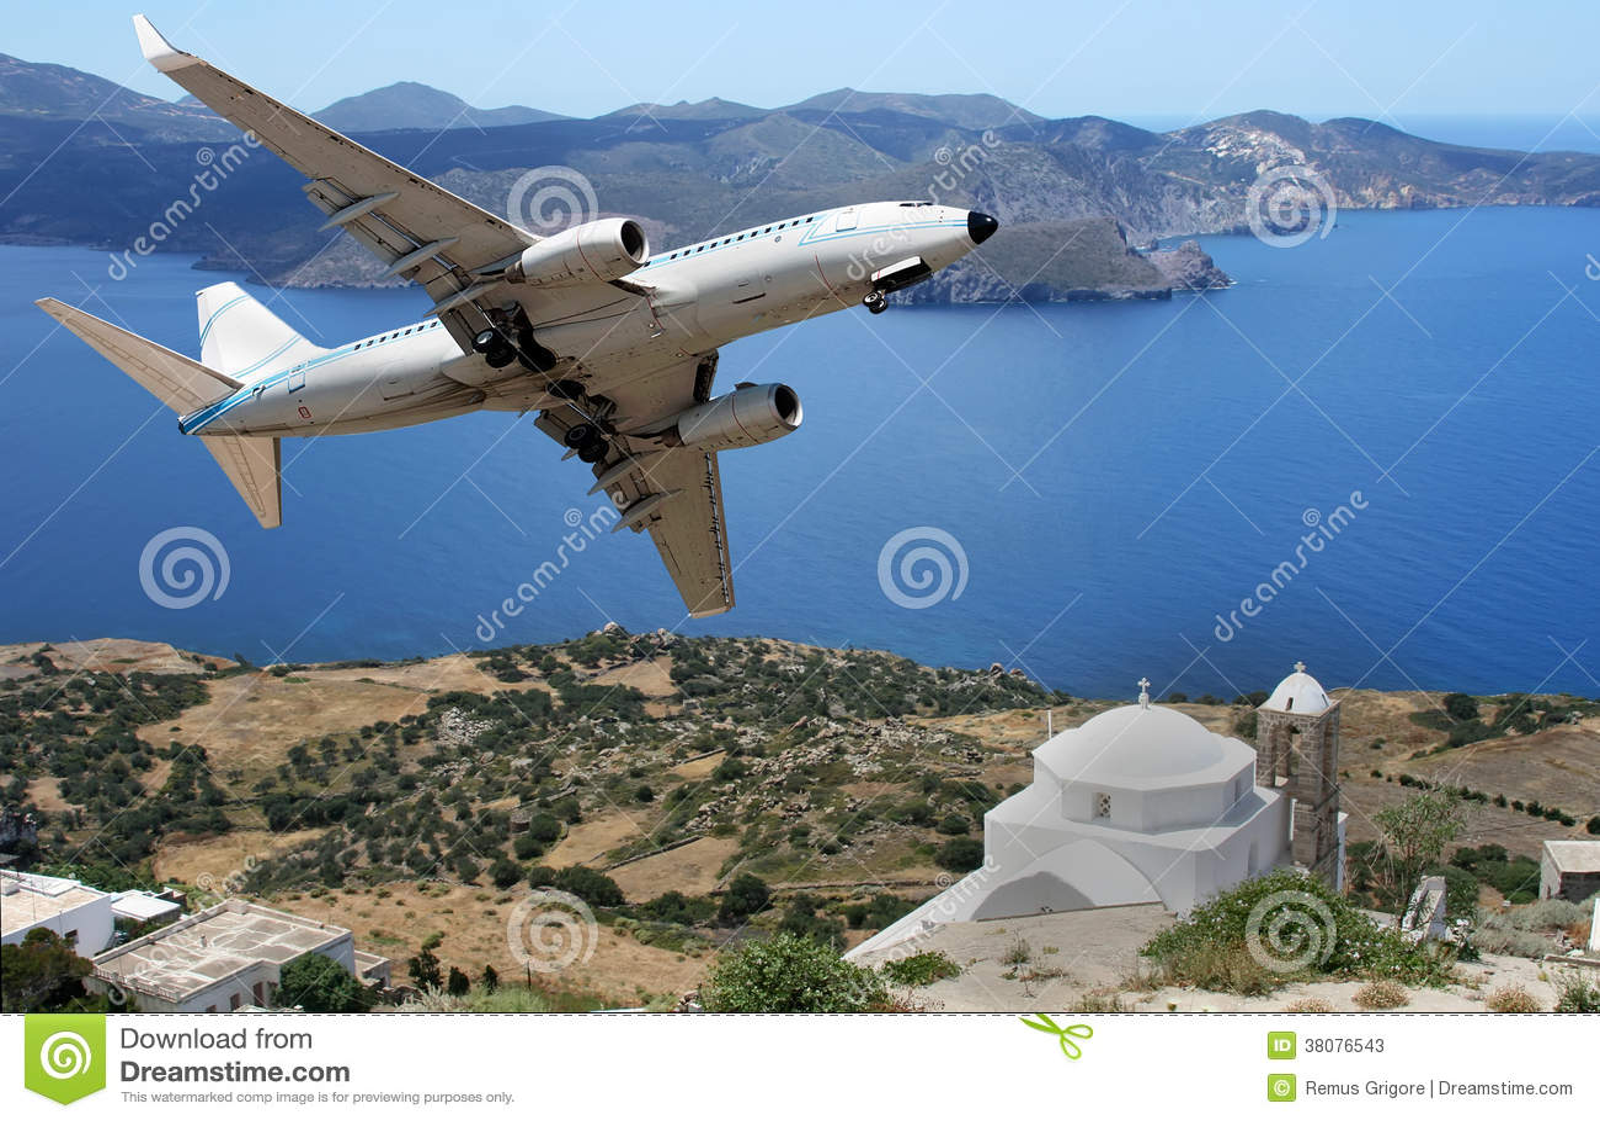 Airplane over a greek insland